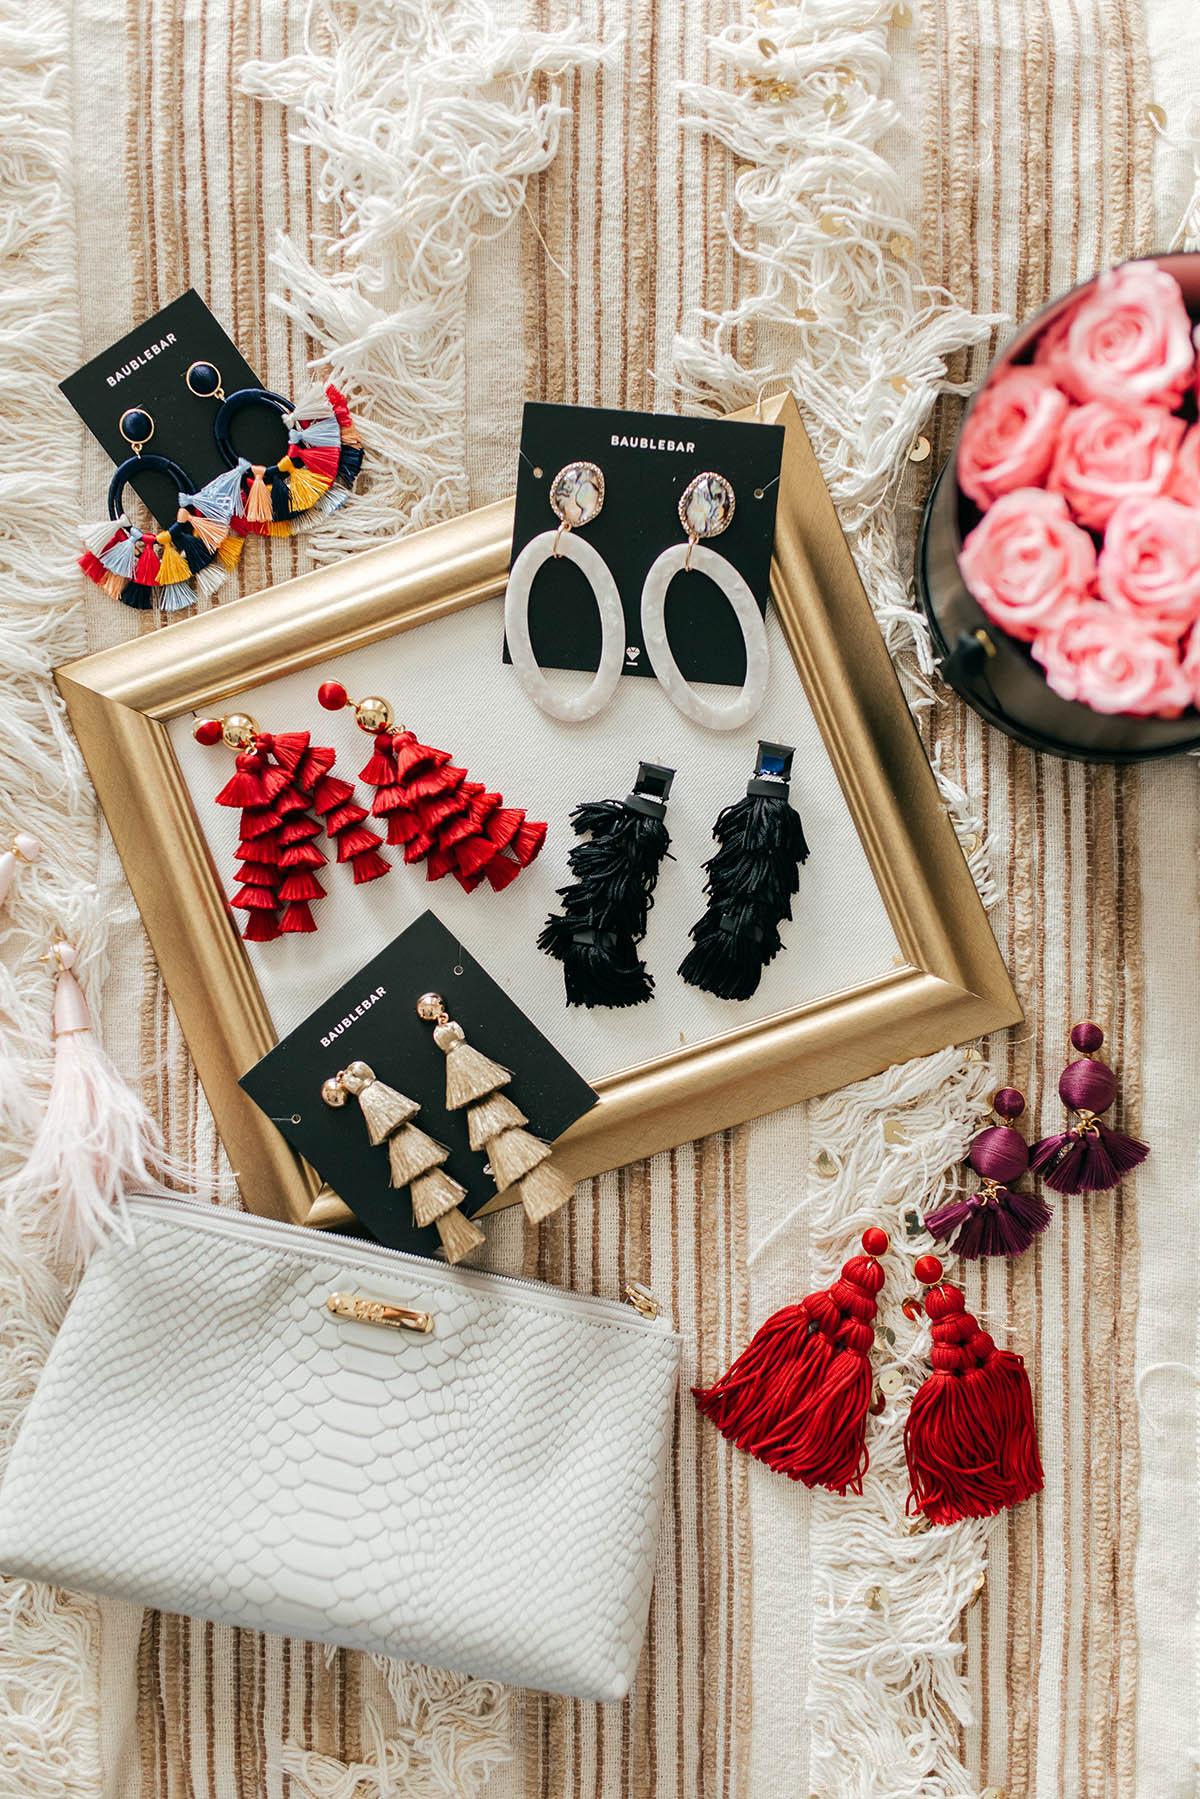 Spring Statement Earrings | Baublebar New Arrivals